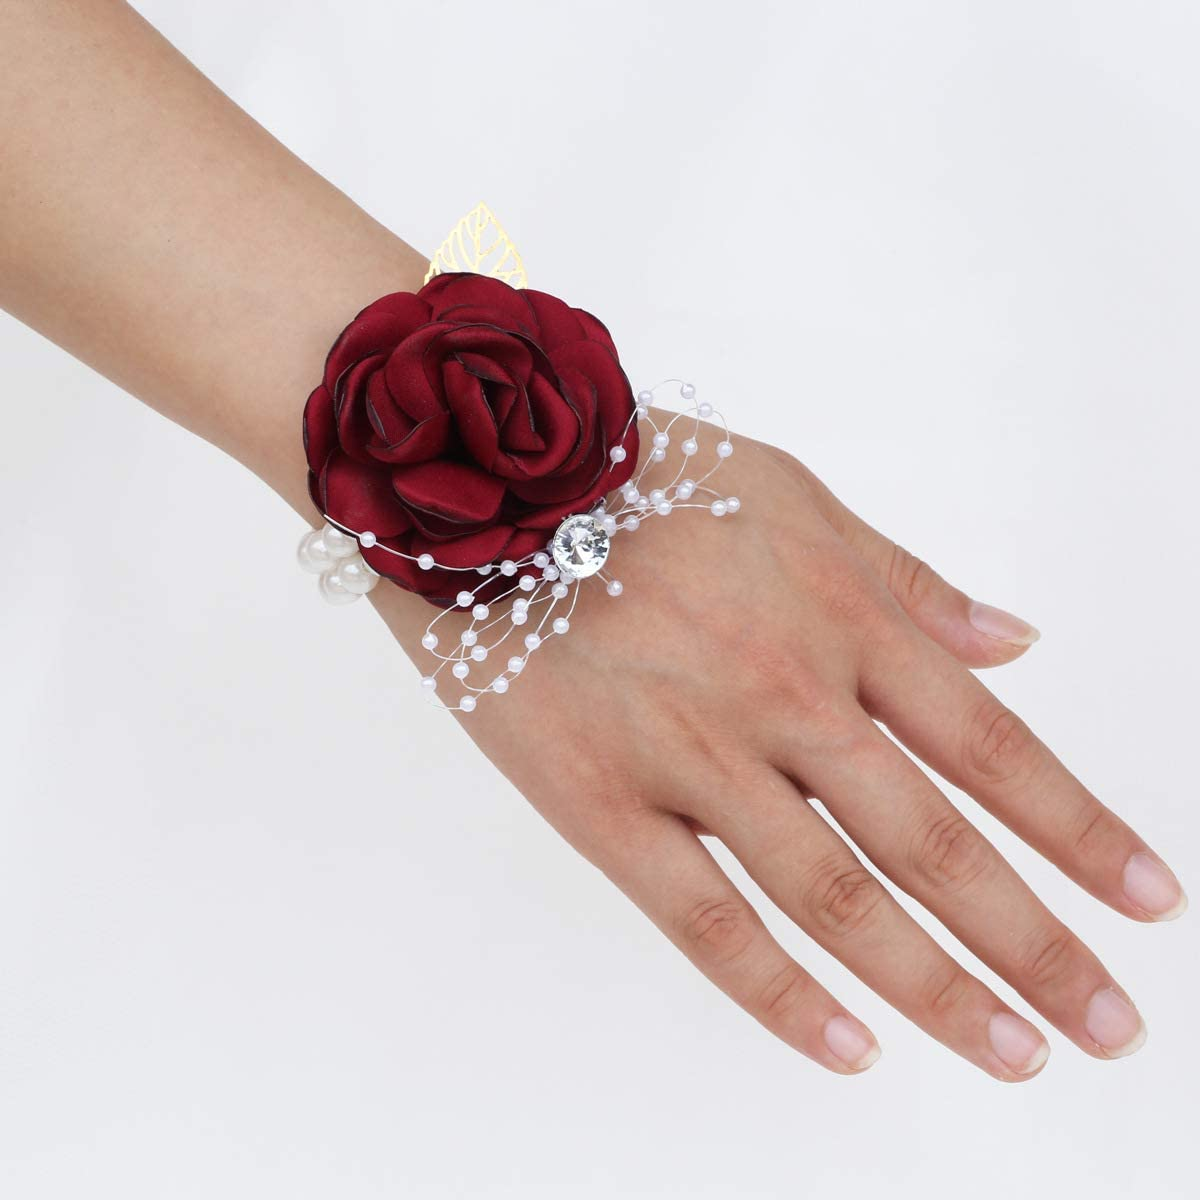 Desuness Wedding Bridal Wrist Corsage Men's Boutonniere Handmade Satin Rose Bridesmaid Wrist Flower Corsage Flower Bridegroom Boutonniere for Wedding Prim Party Homecoming (Burgundy, Wrist Corsage)